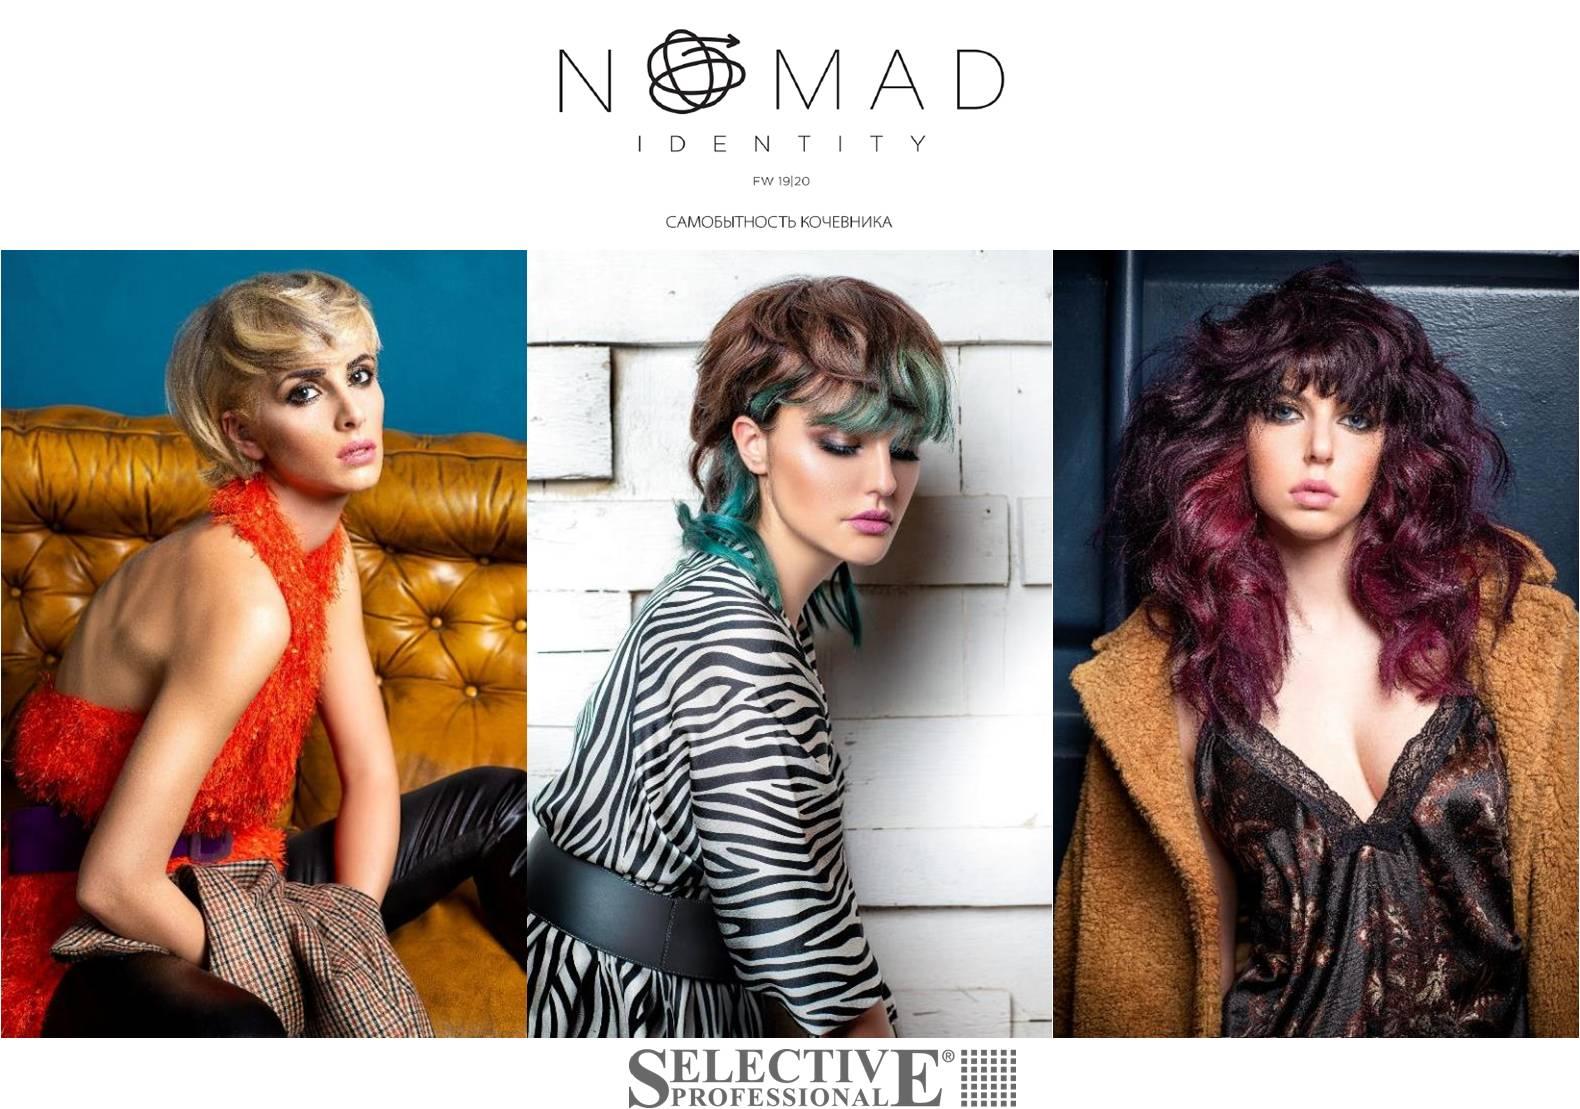 Коллекция «Nomad's Identity / Самобытность Кочевника» осень-зима 2019-2020 от бренда Selective Professional